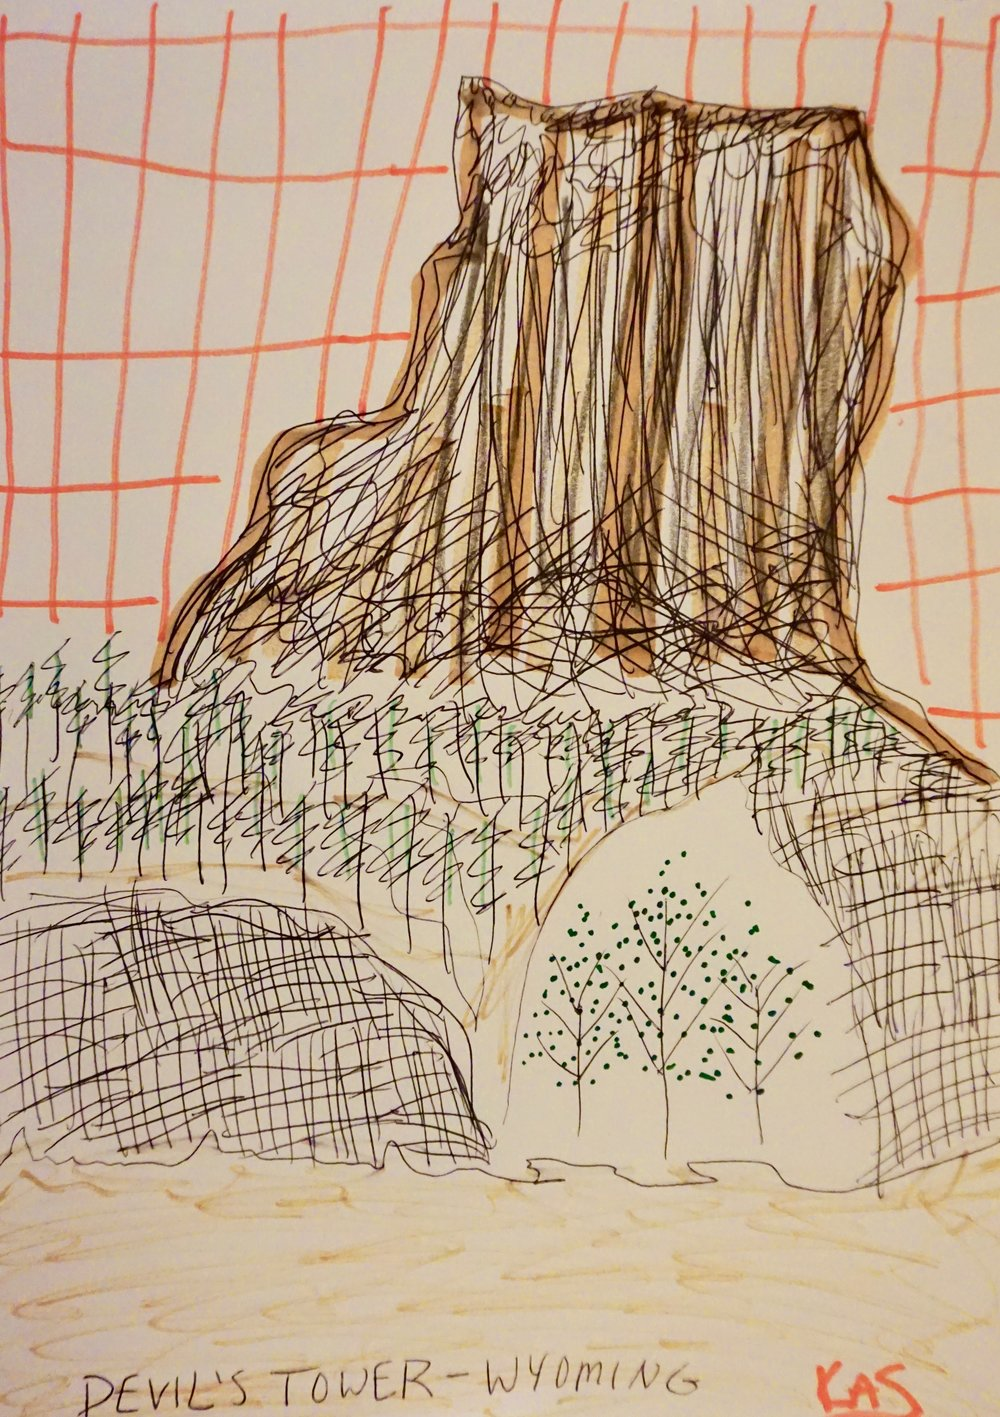 Devil's Tower Expressive Landscape by Kathryn Sturges